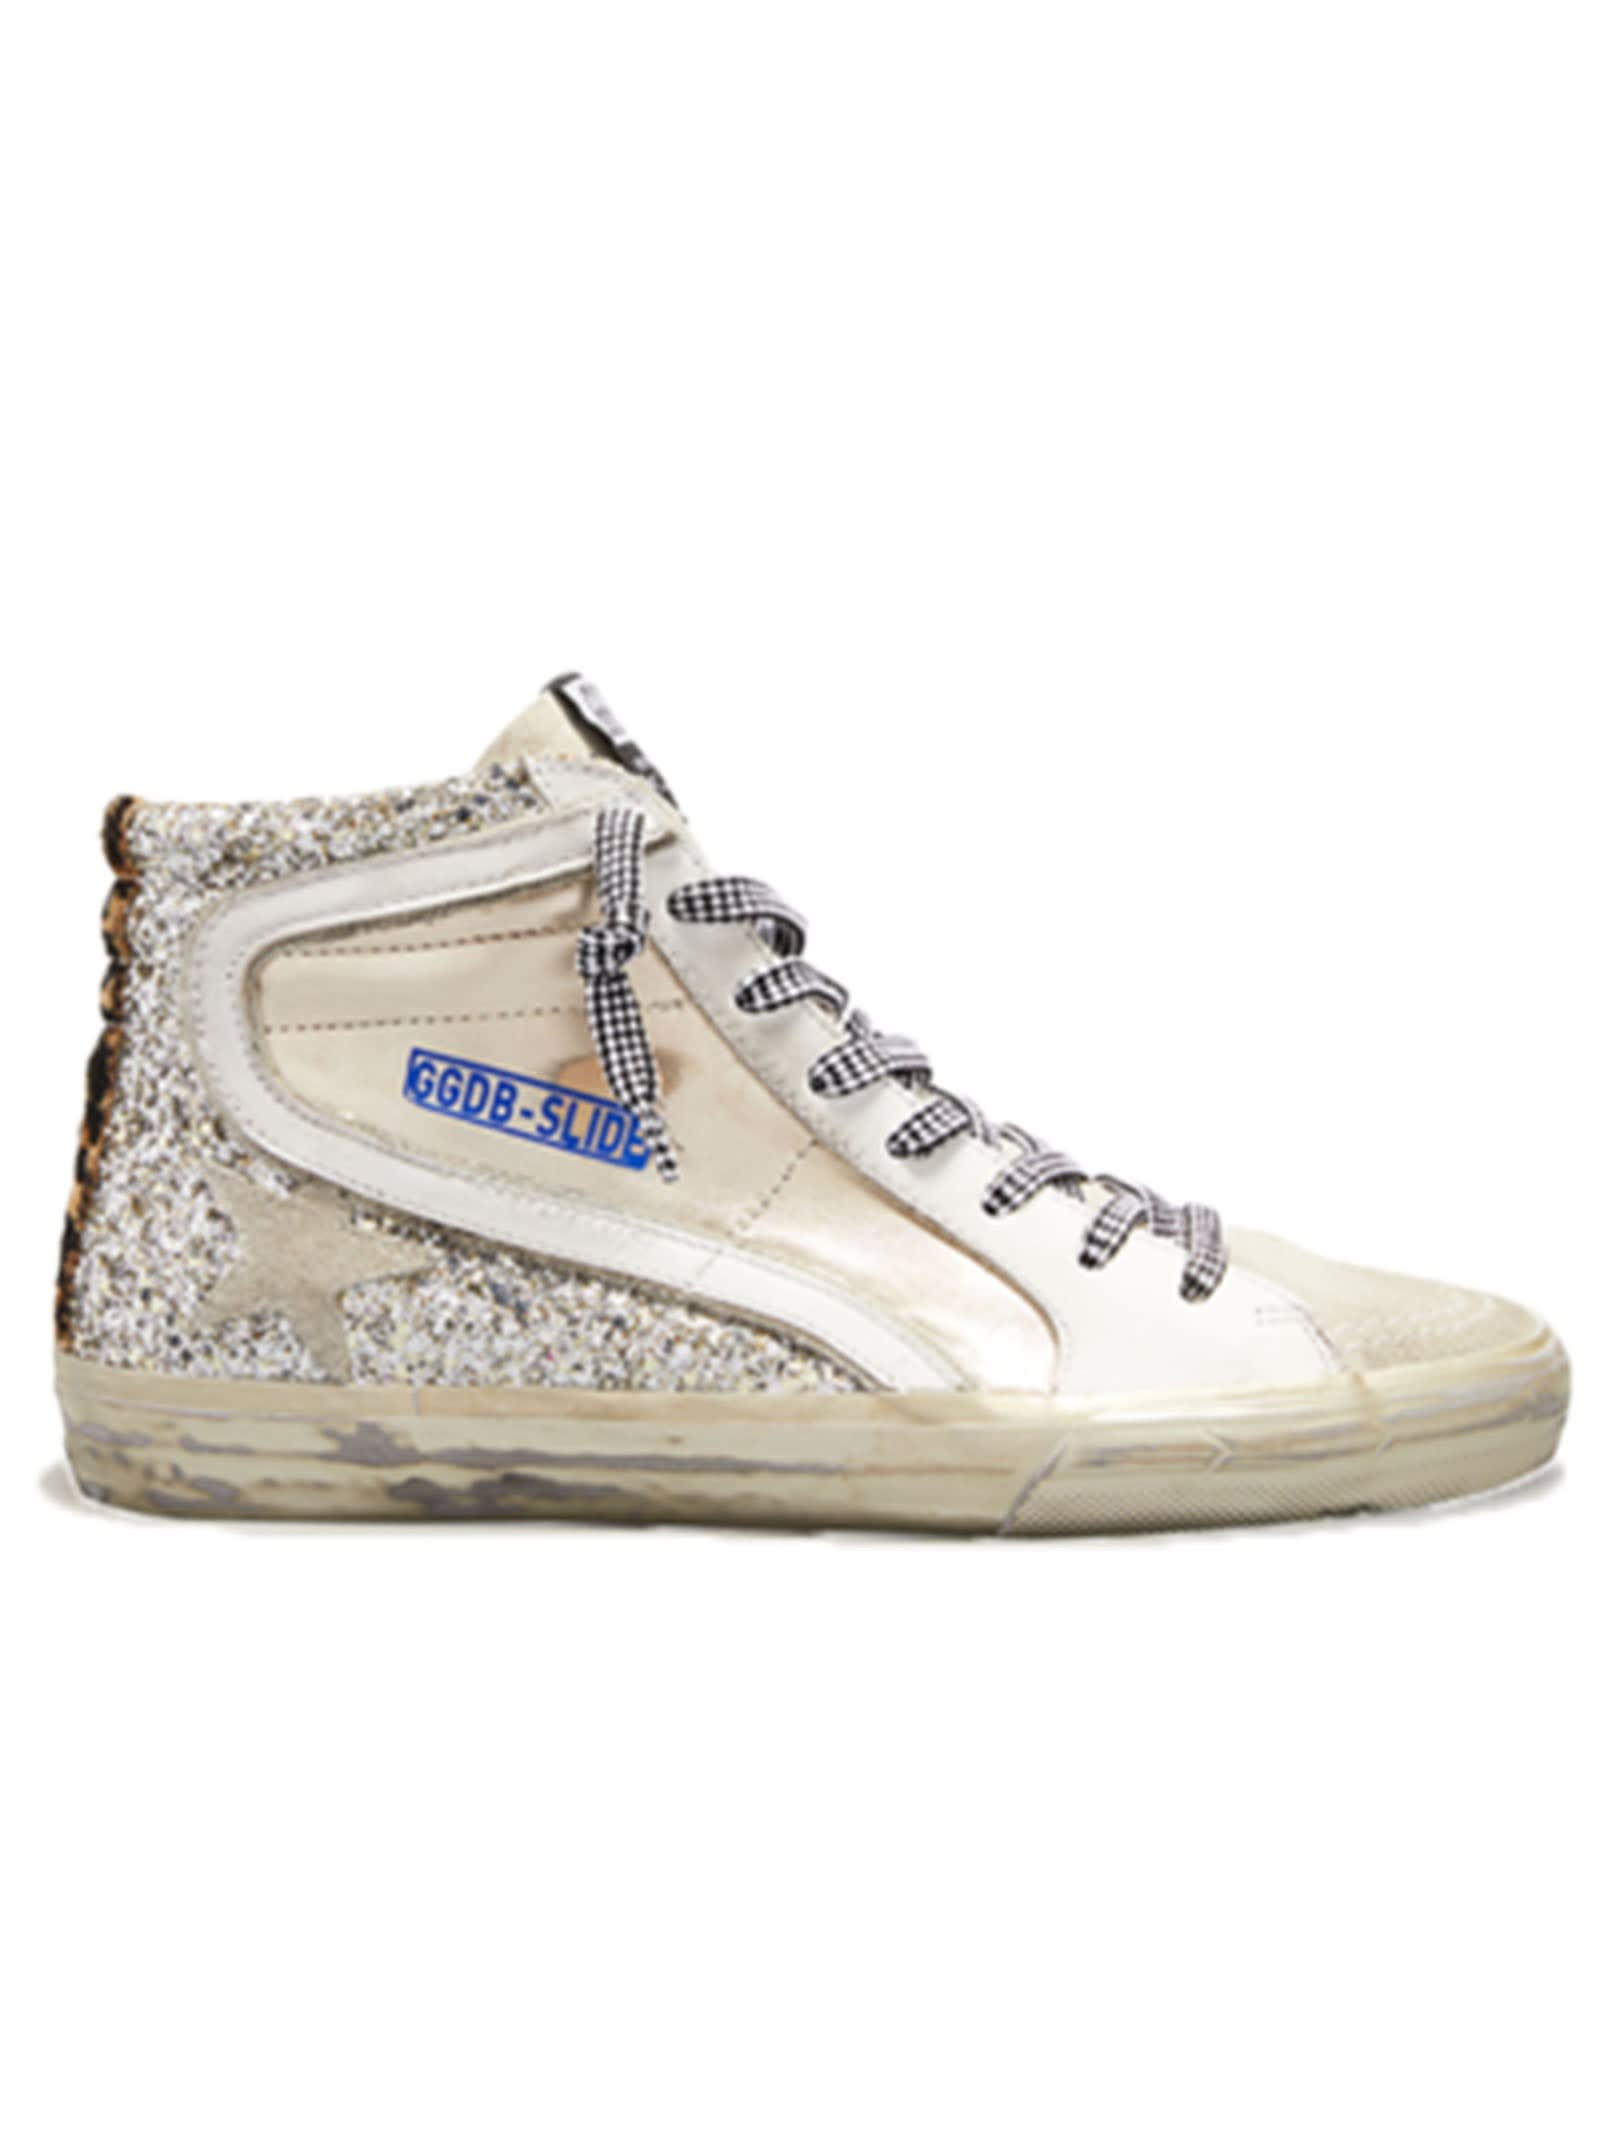 Golden Goose Silver Slide Sneakers